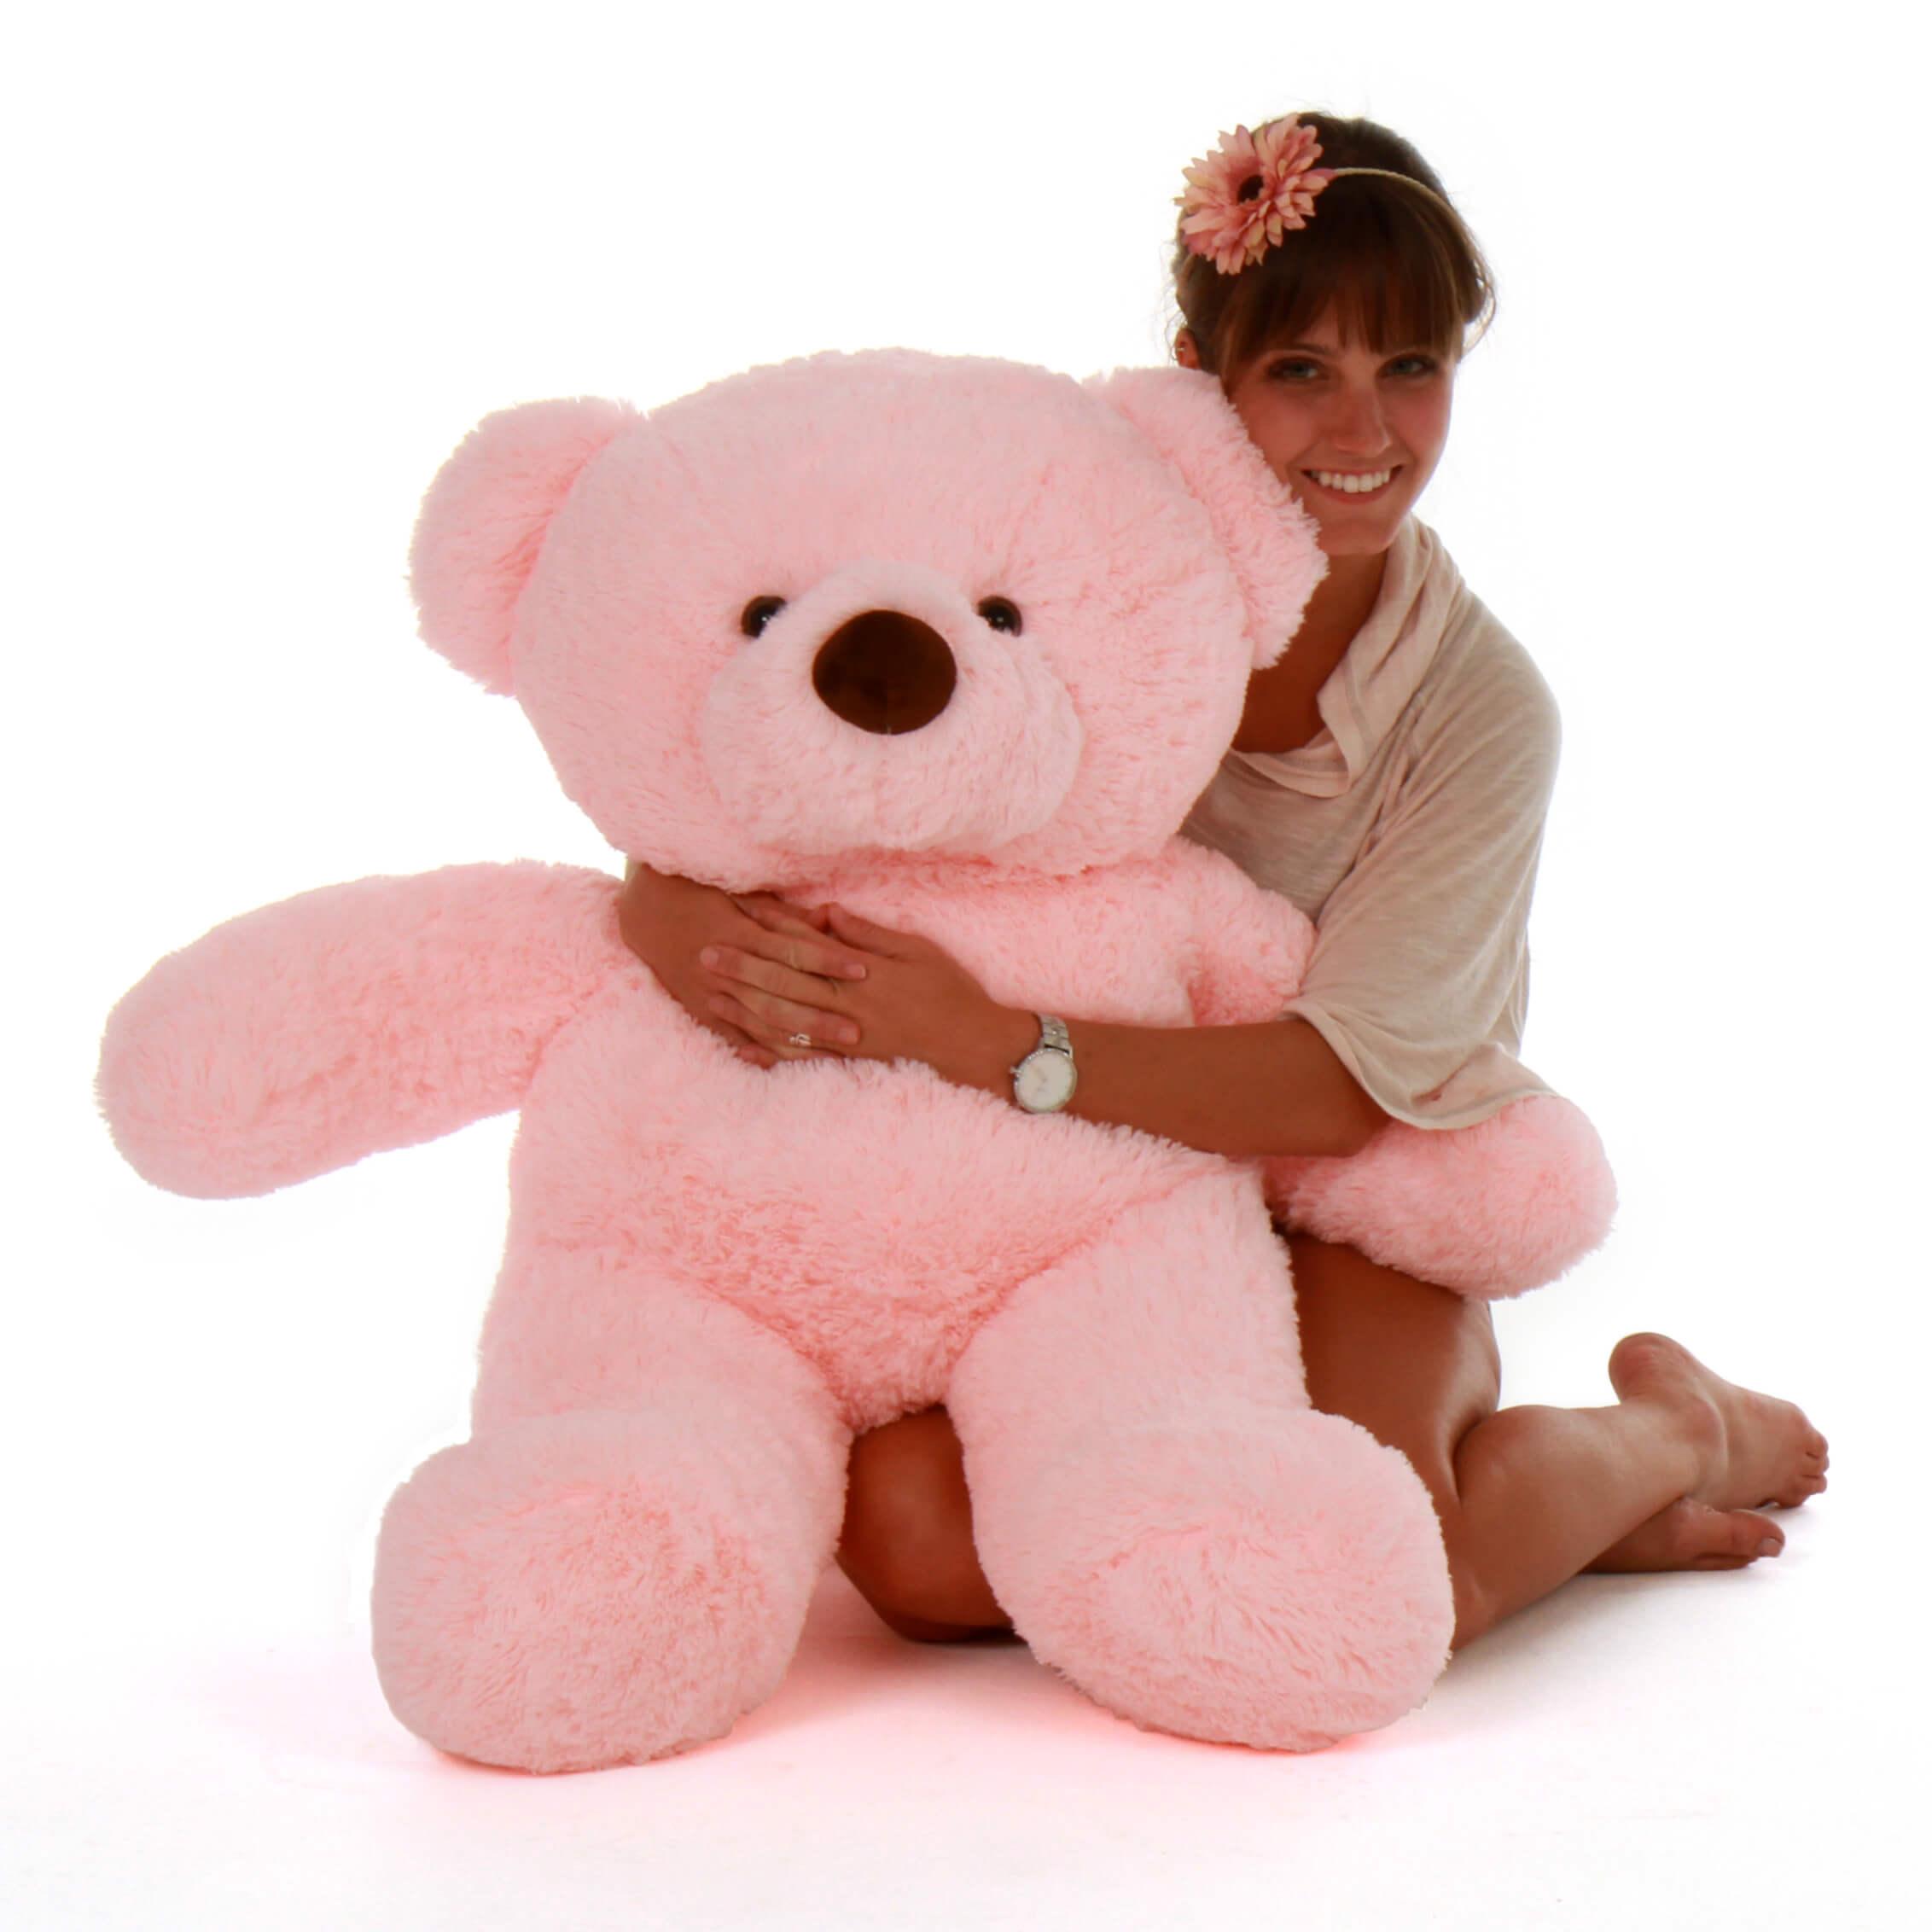 3ft-pink-big-stuffed-teddy-bear-gigi-chubs-best-gift-1.jpg